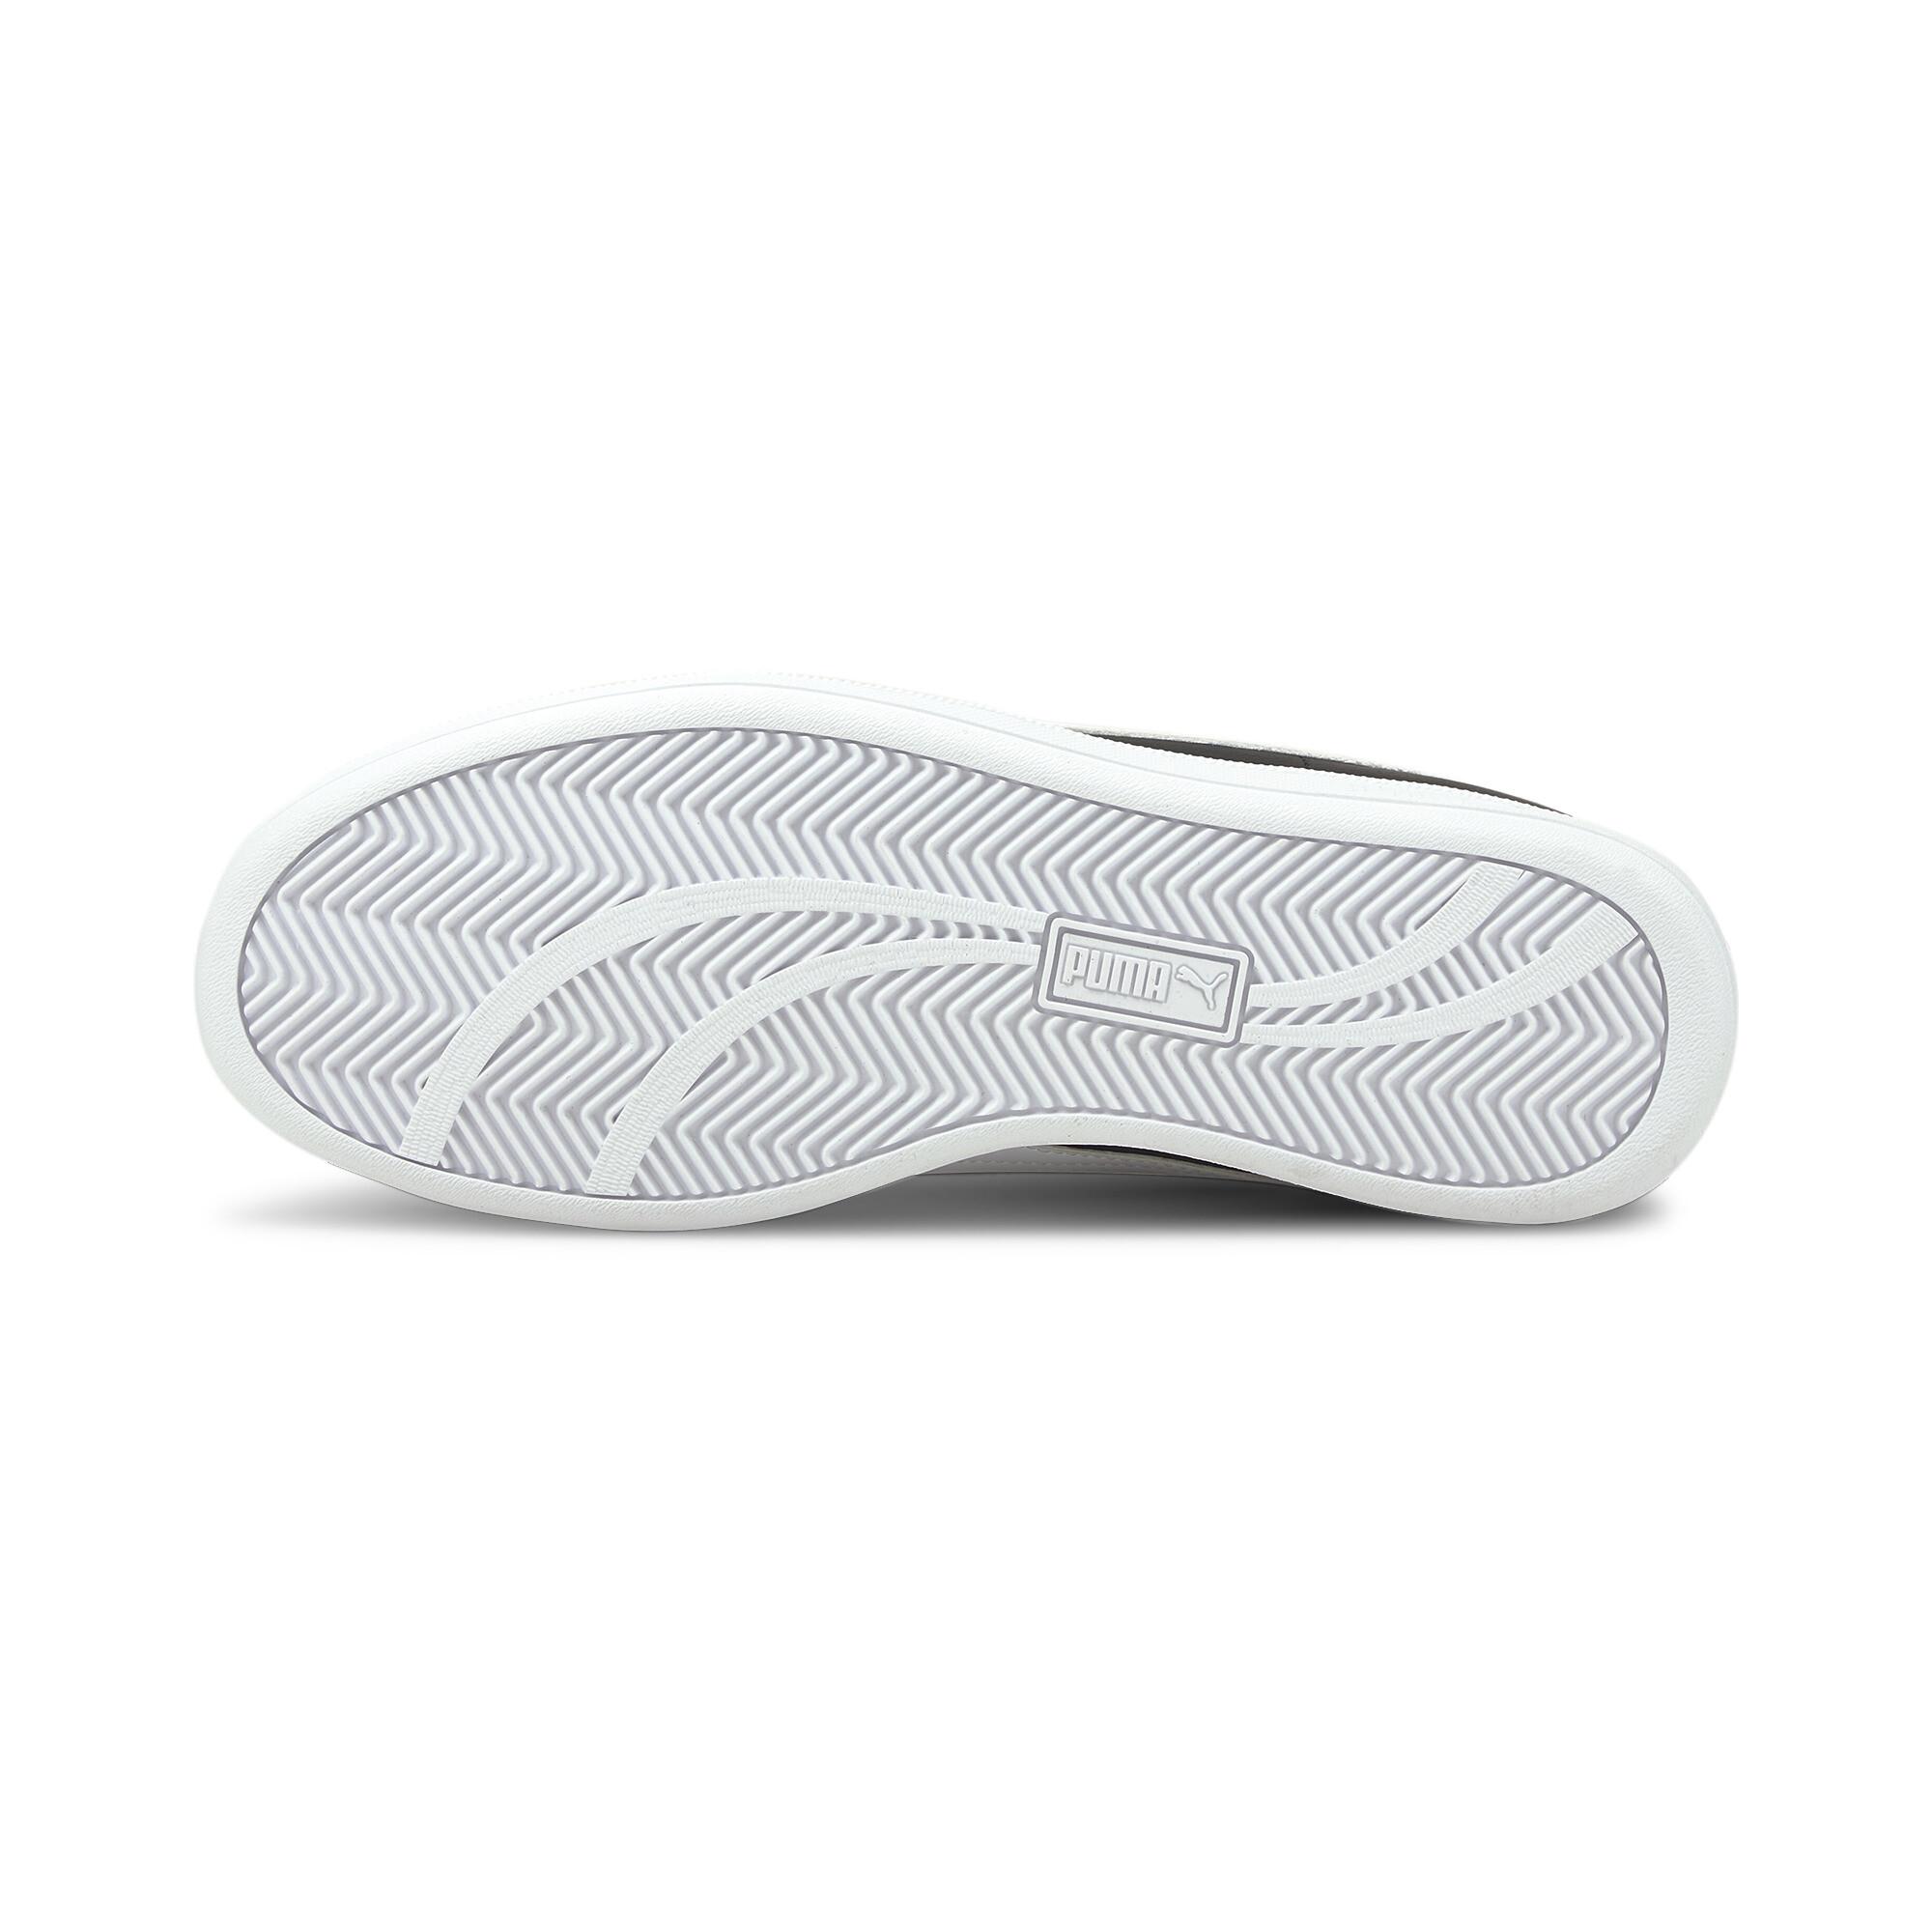 PUMA-Smash-Trainers-Schuhe-Sneakers-Sport-Classics-Unisex-Neu Indexbild 20